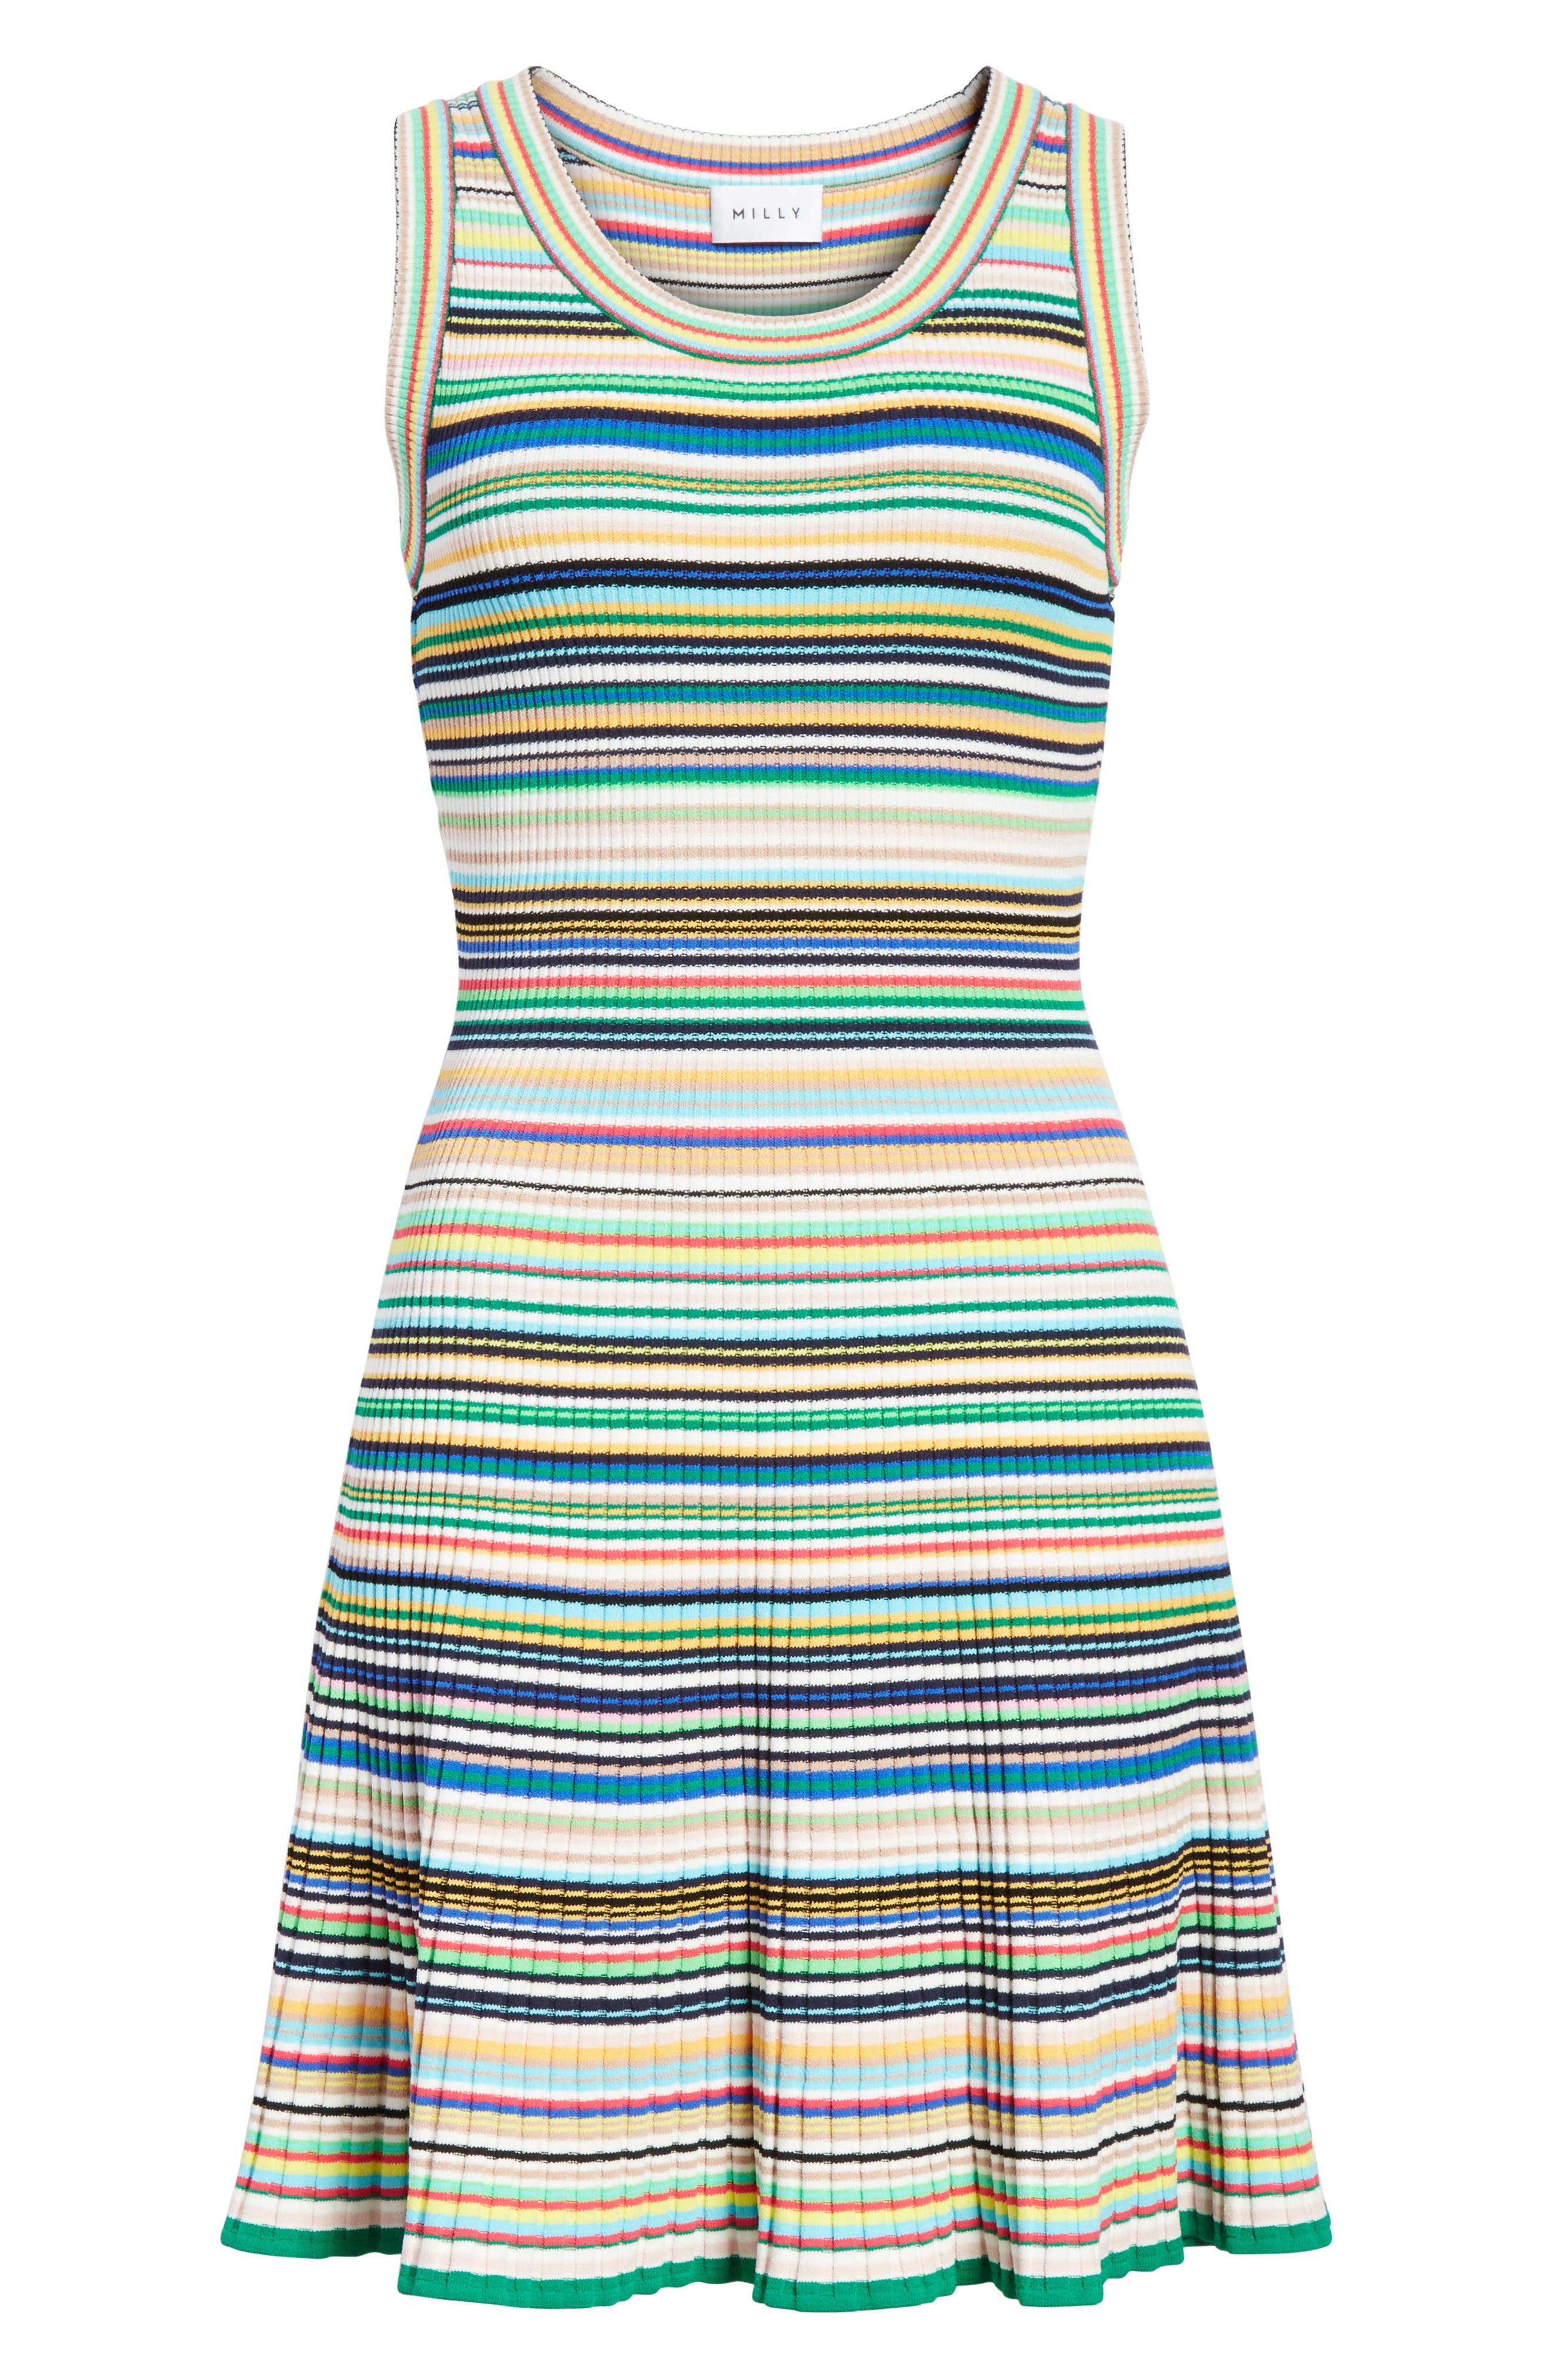 Microstripe Knit Fit & Flare Dress,                             Alternate thumbnail 6, color,                             Rainbow Multi